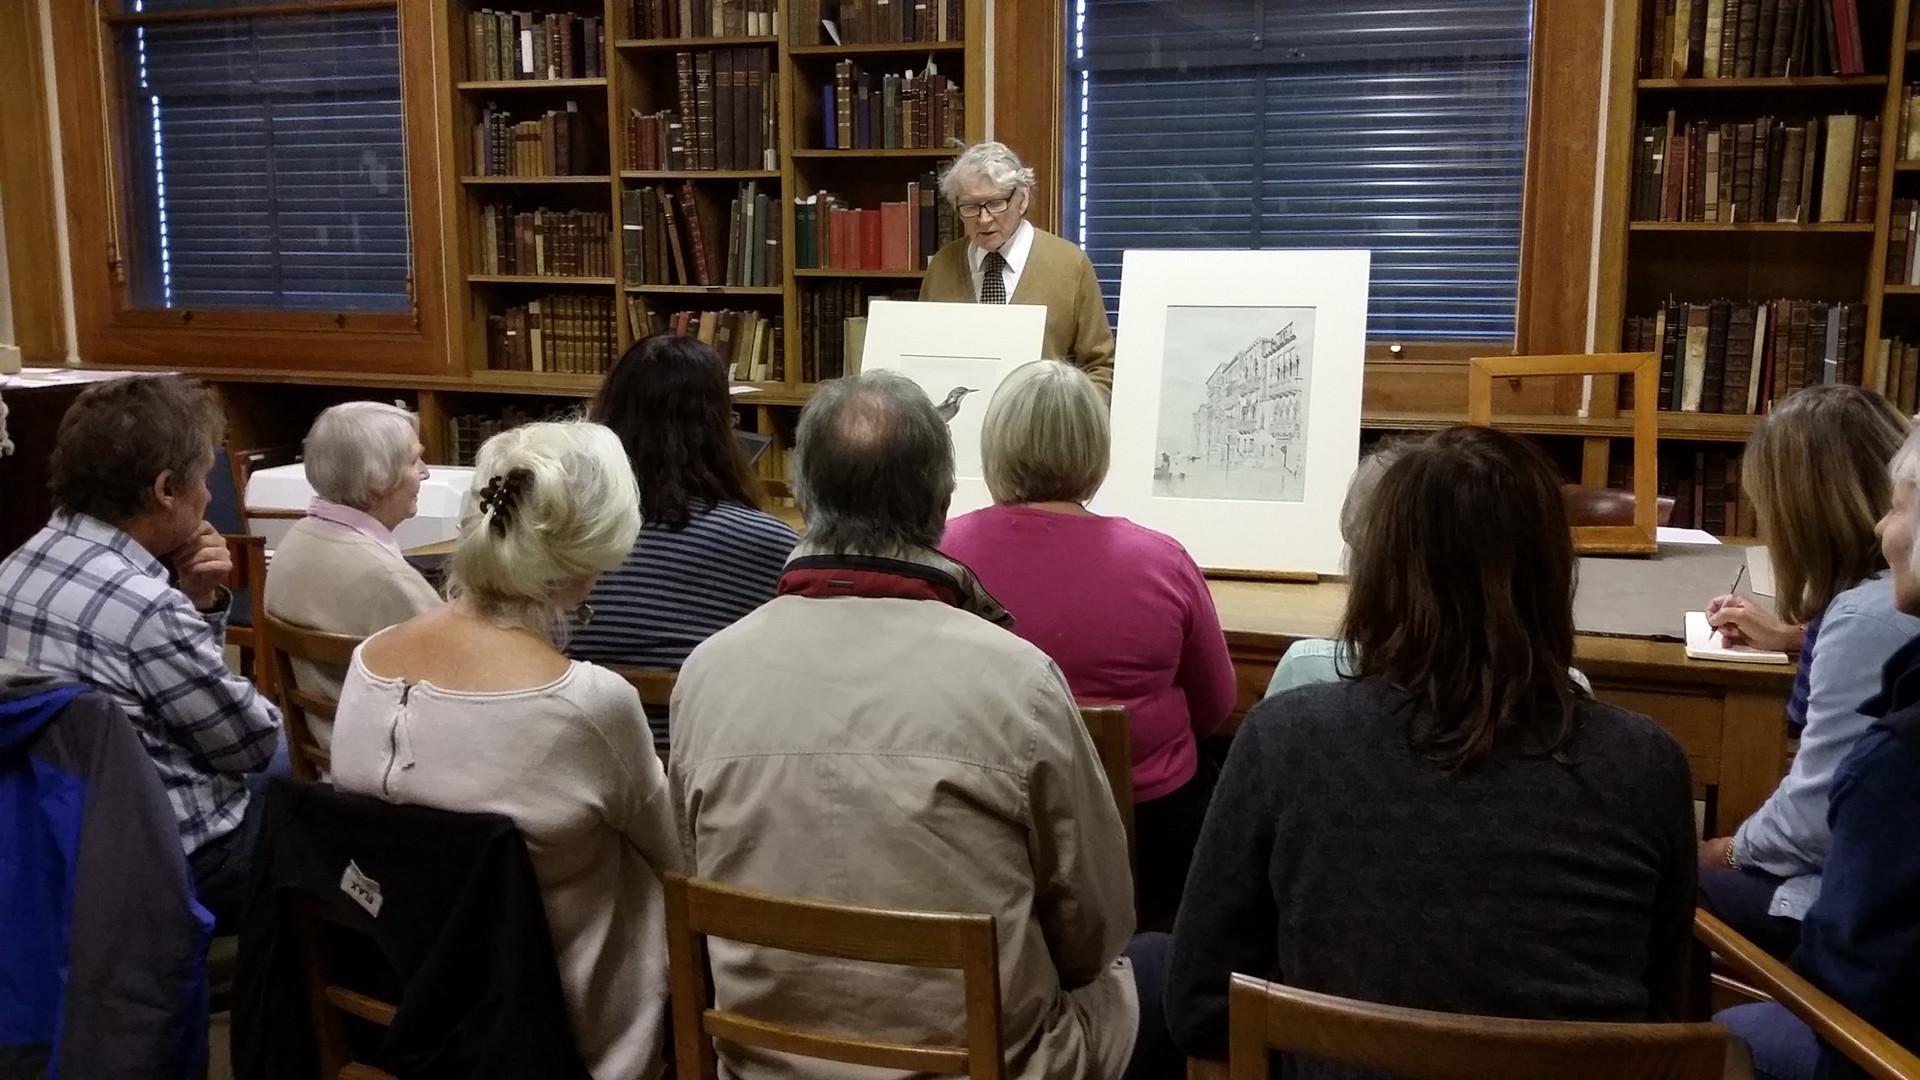 Talk by John Whitely in the Western Art Printroom